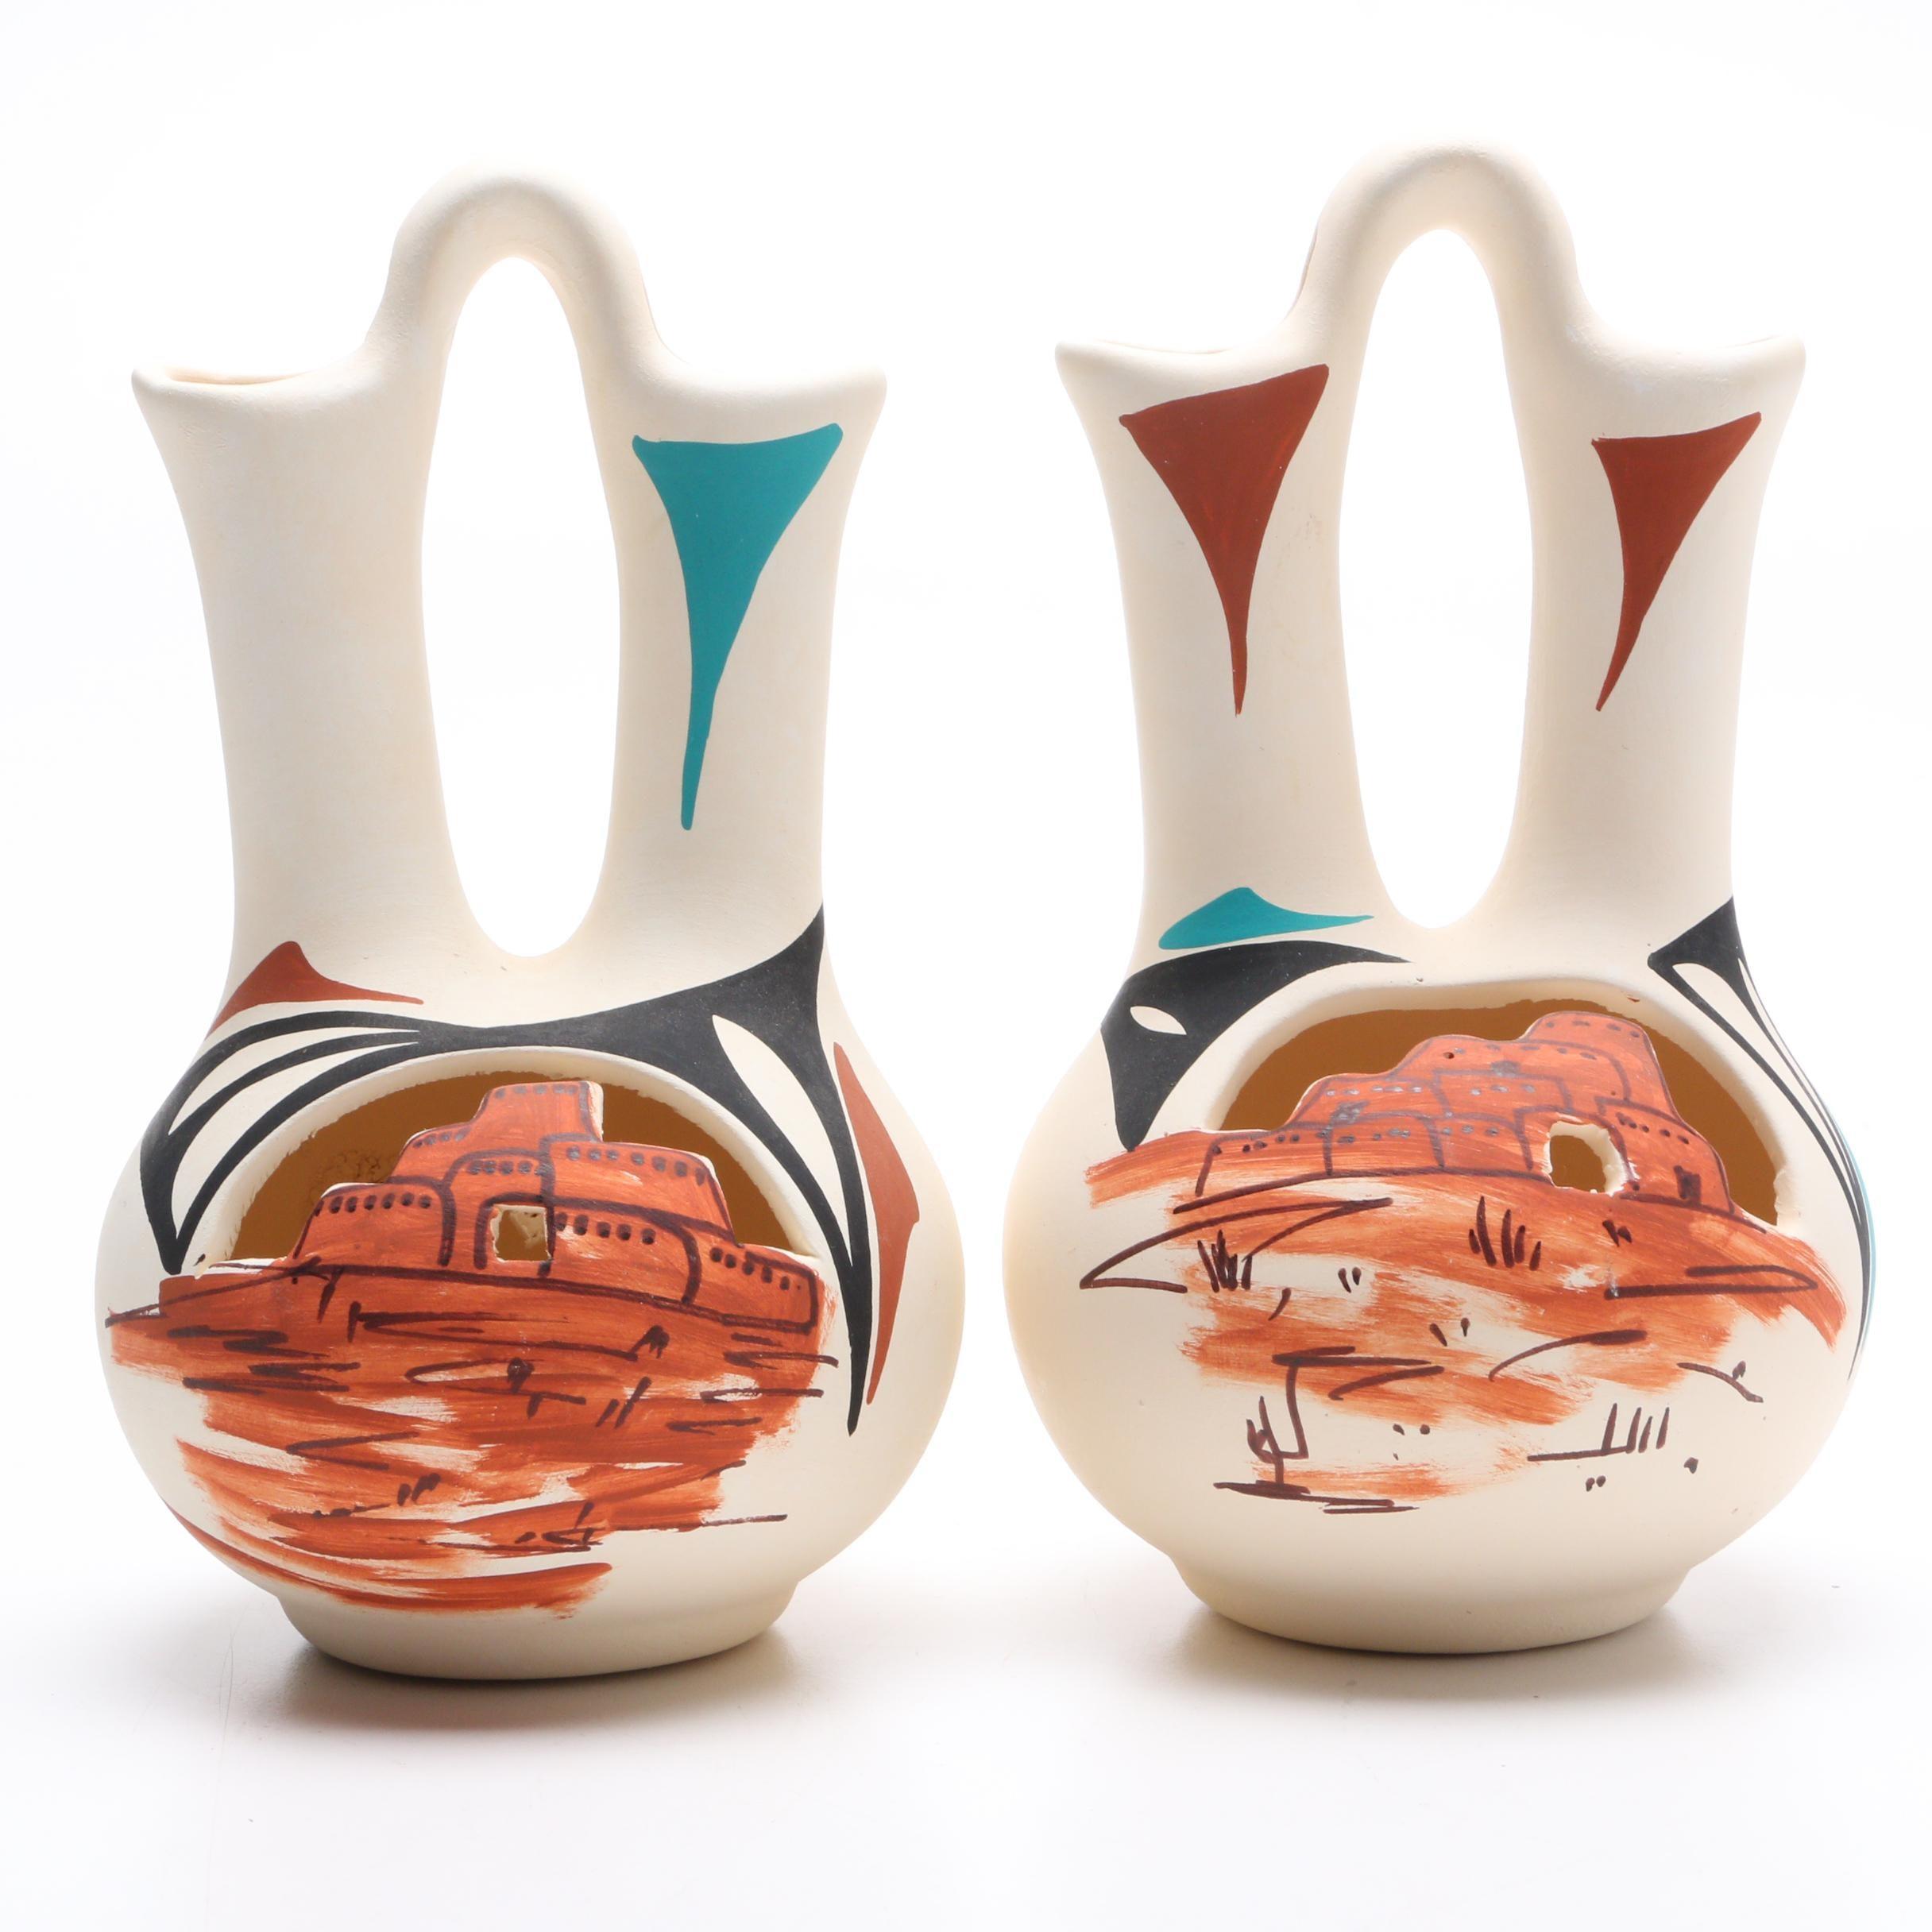 Jemez Pueblo Wedding Vases Signed by Native American Artist L. Toya